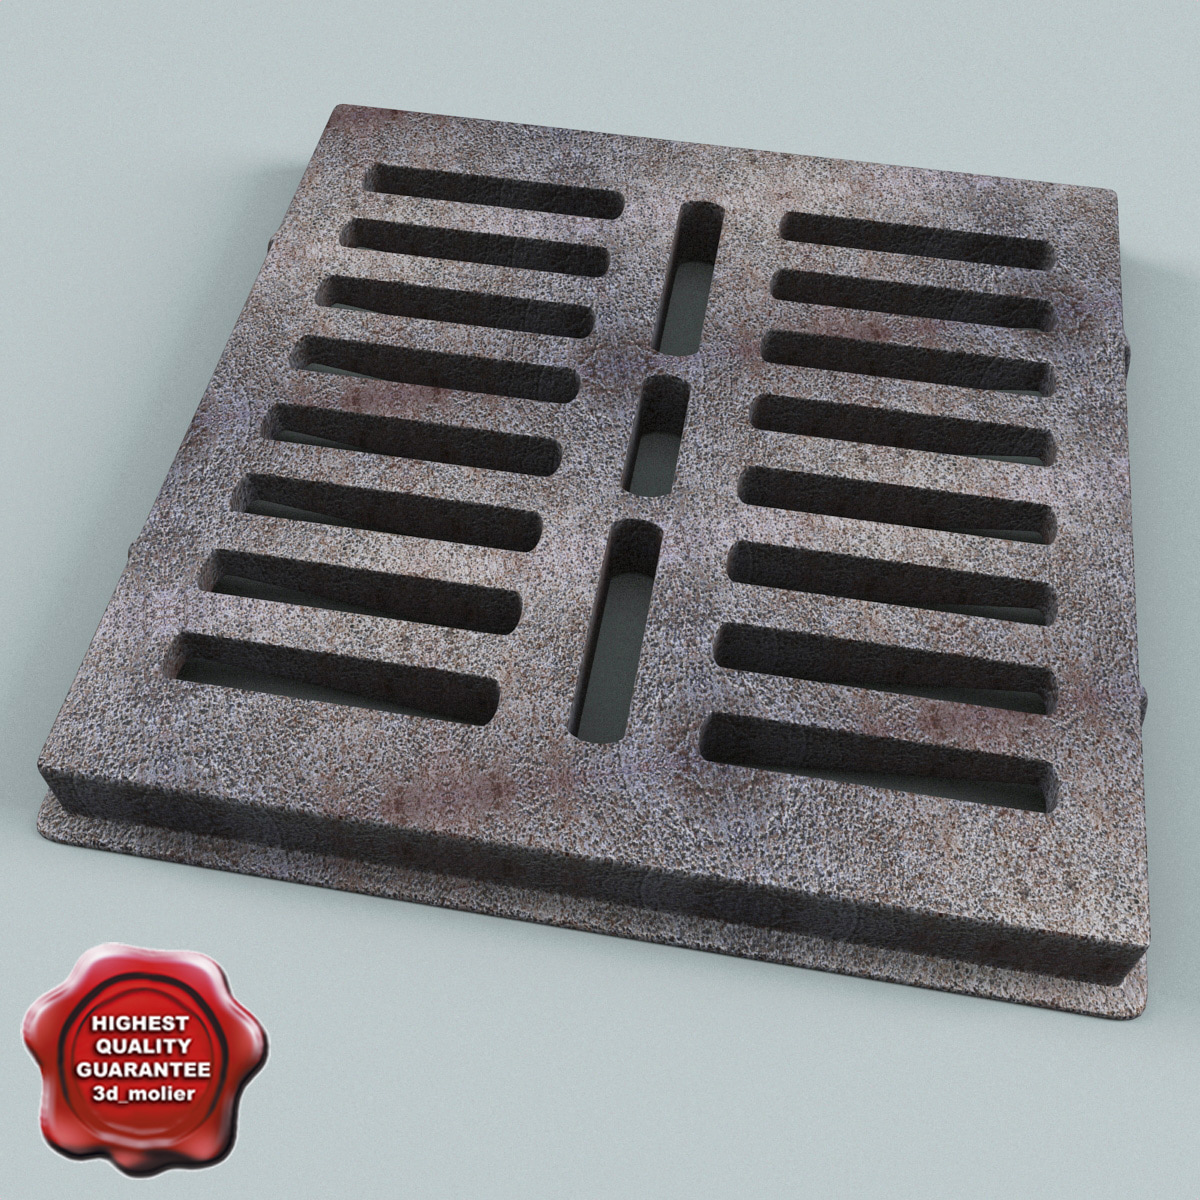 Sewer_Grate_00.jpg